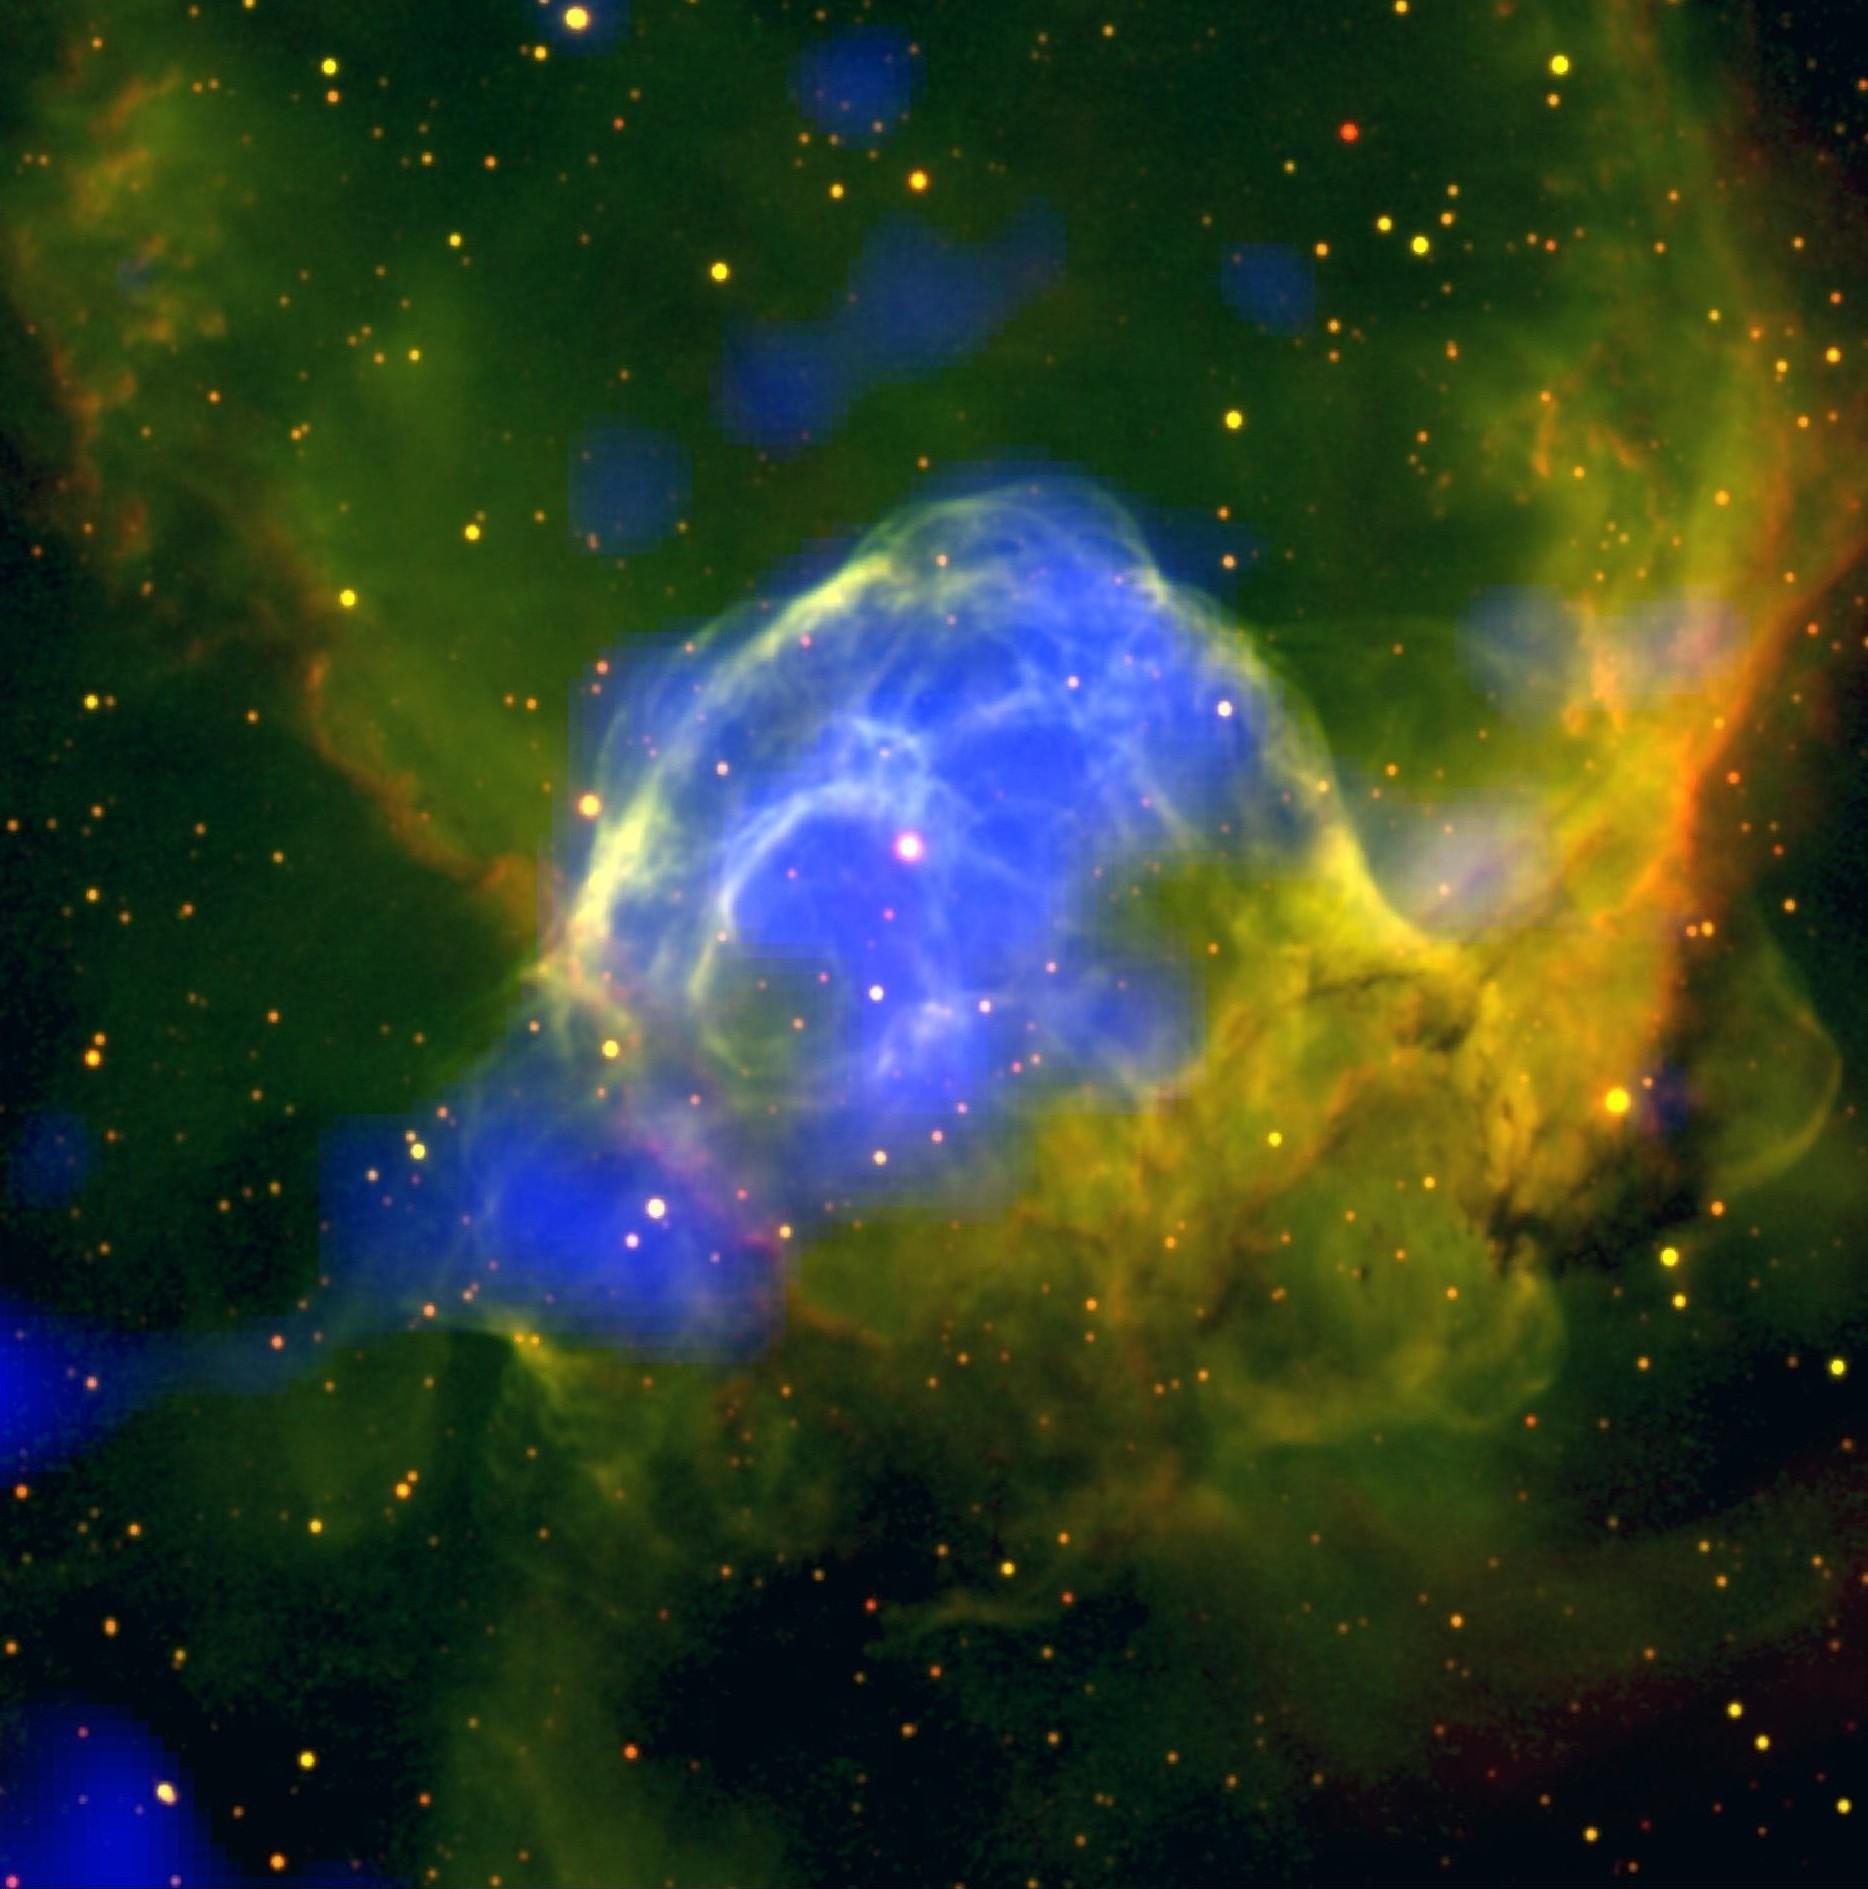 neon nebula in space - photo #15